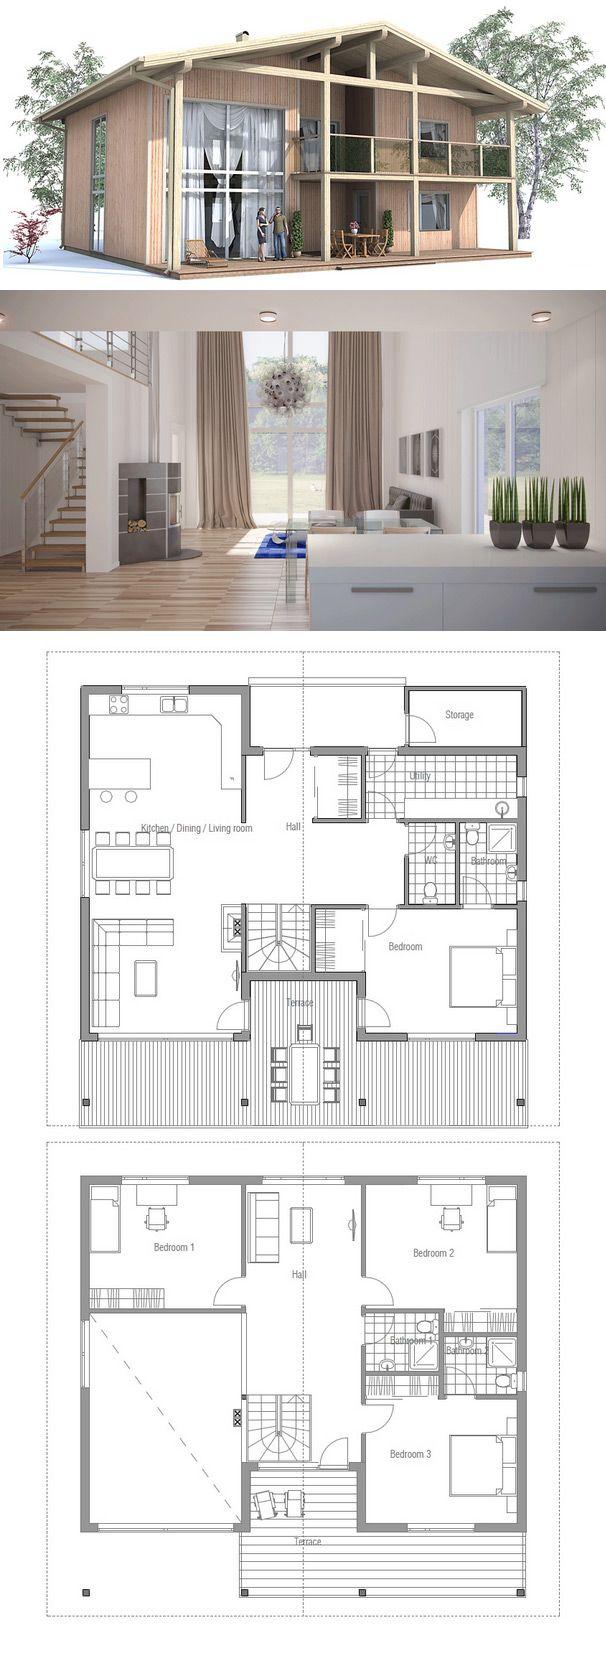 25 best ideas about elevator on pinterest elevator design elevator lobby and lobbies. Black Bedroom Furniture Sets. Home Design Ideas